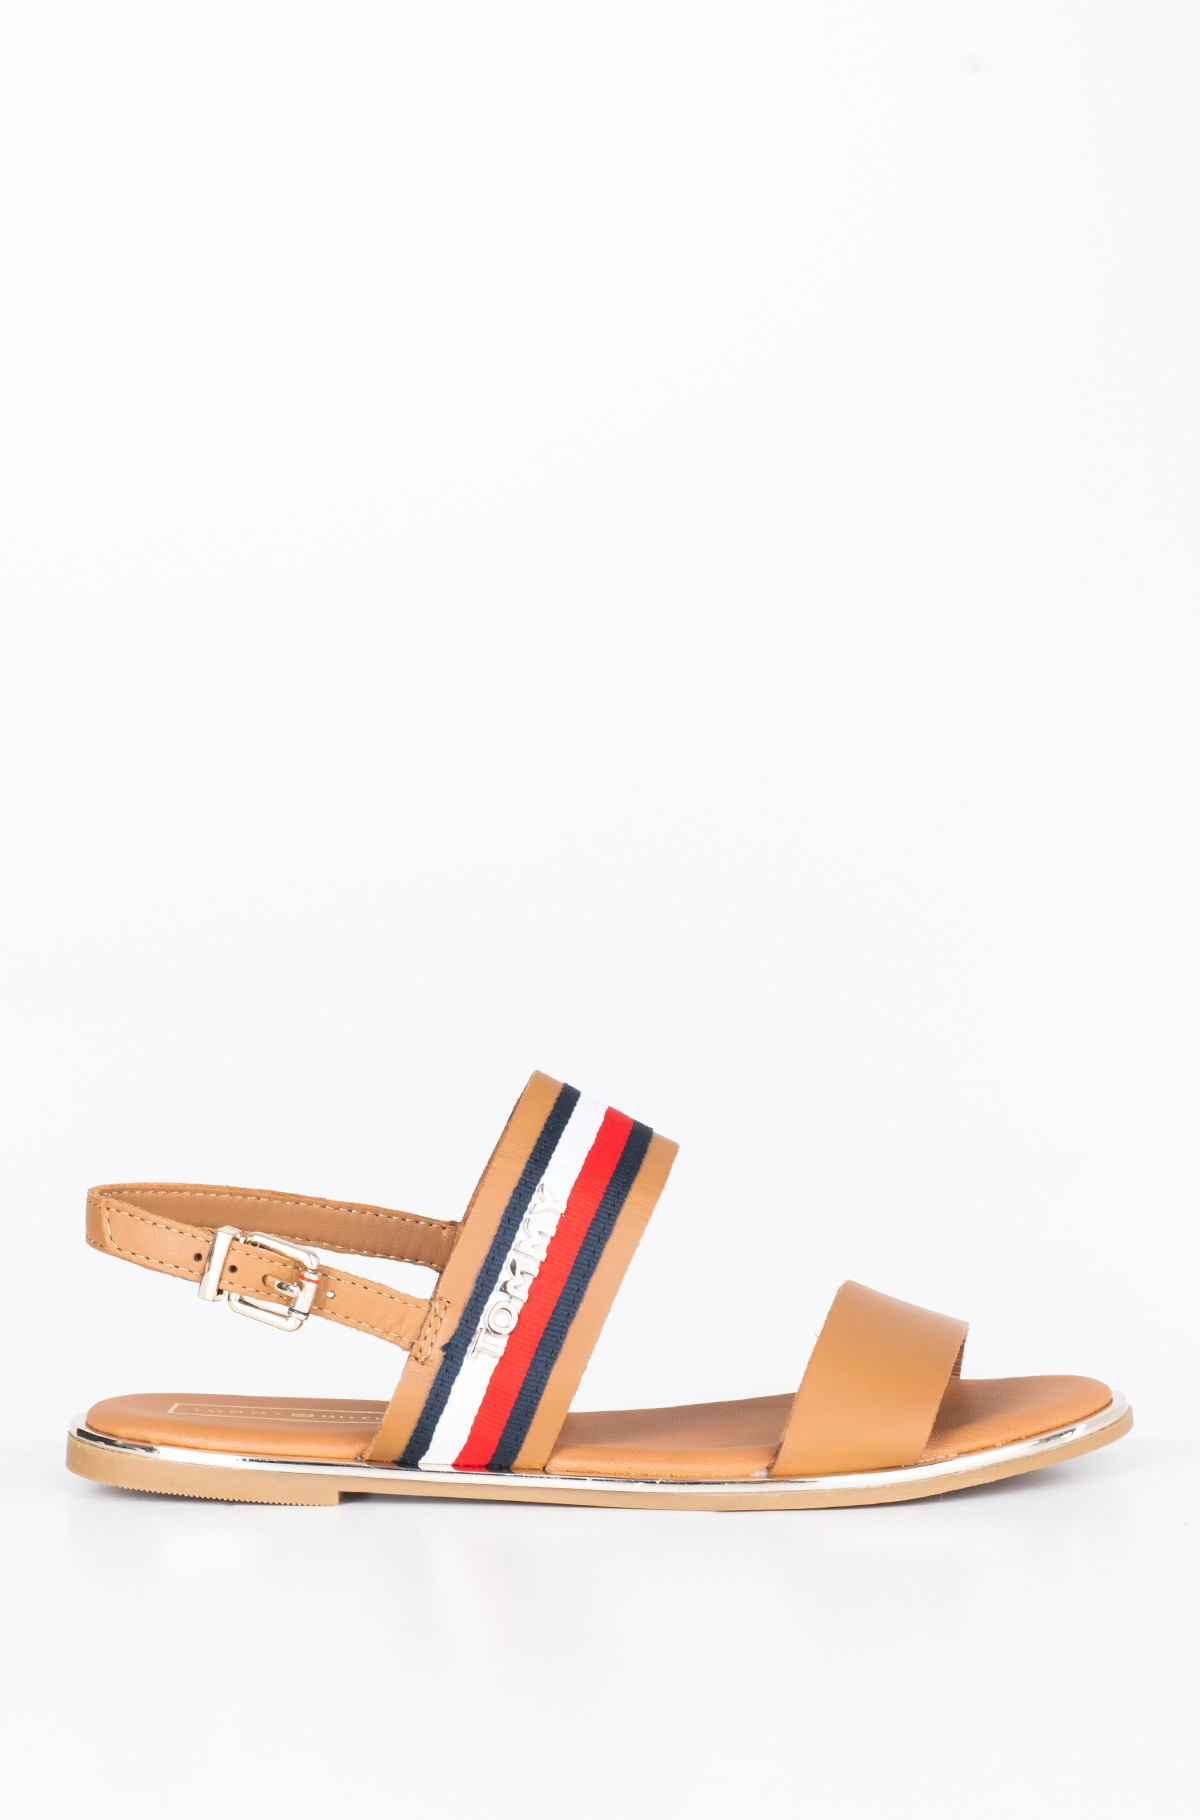 Sandals FLAT SANDAL CORPORATE RIBBON-full-1